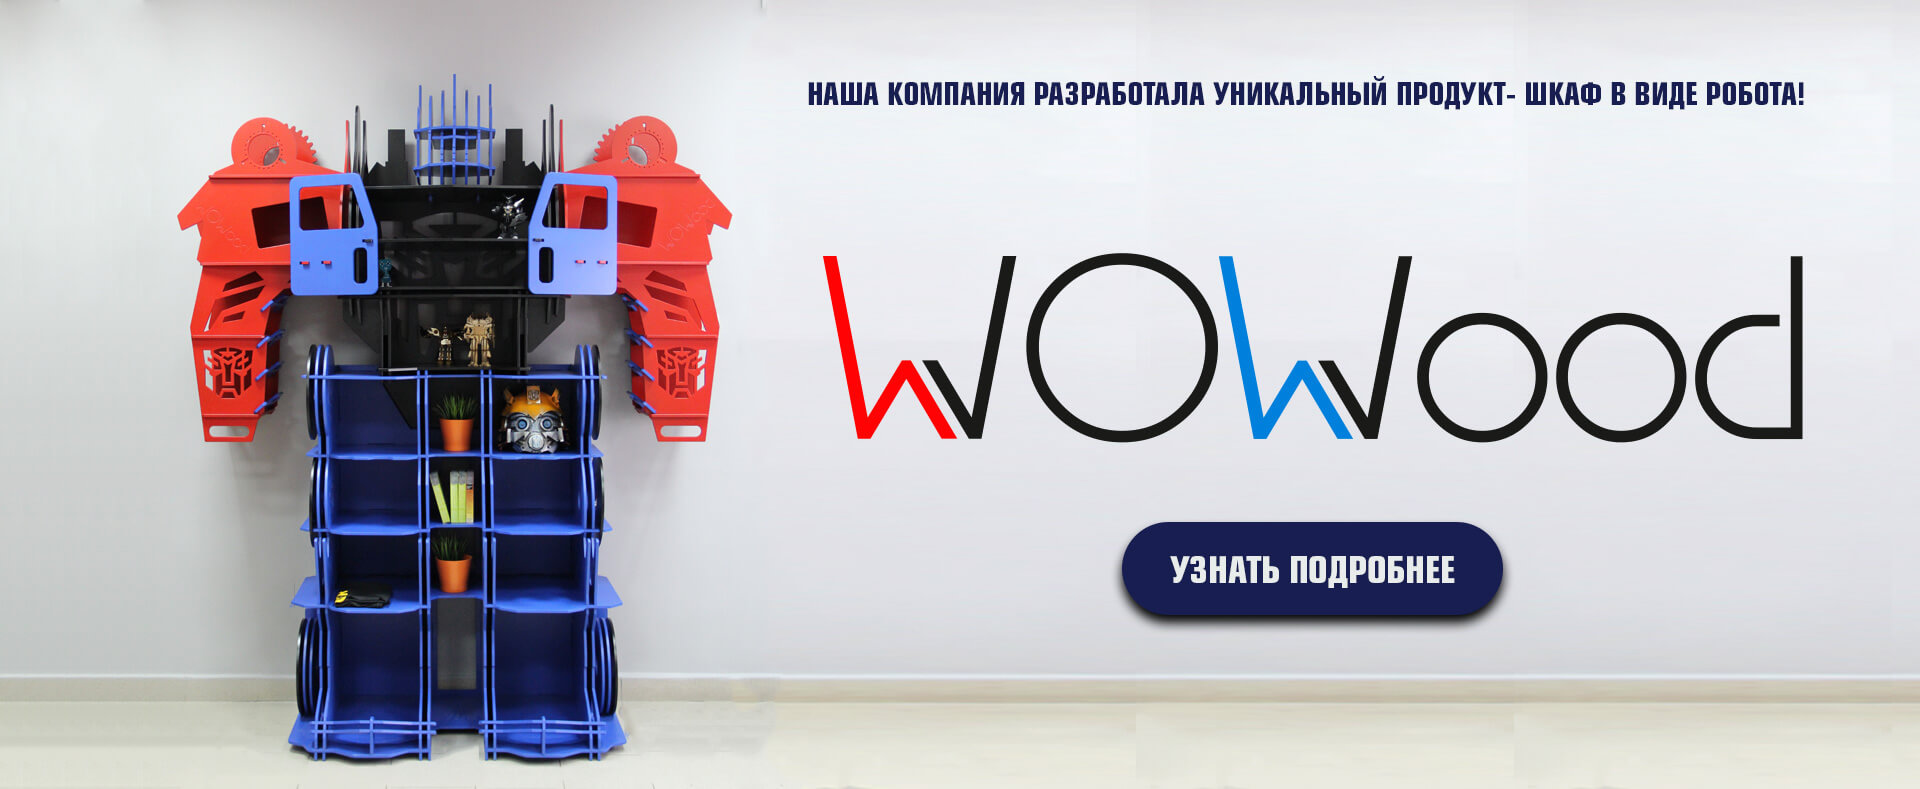 wowood